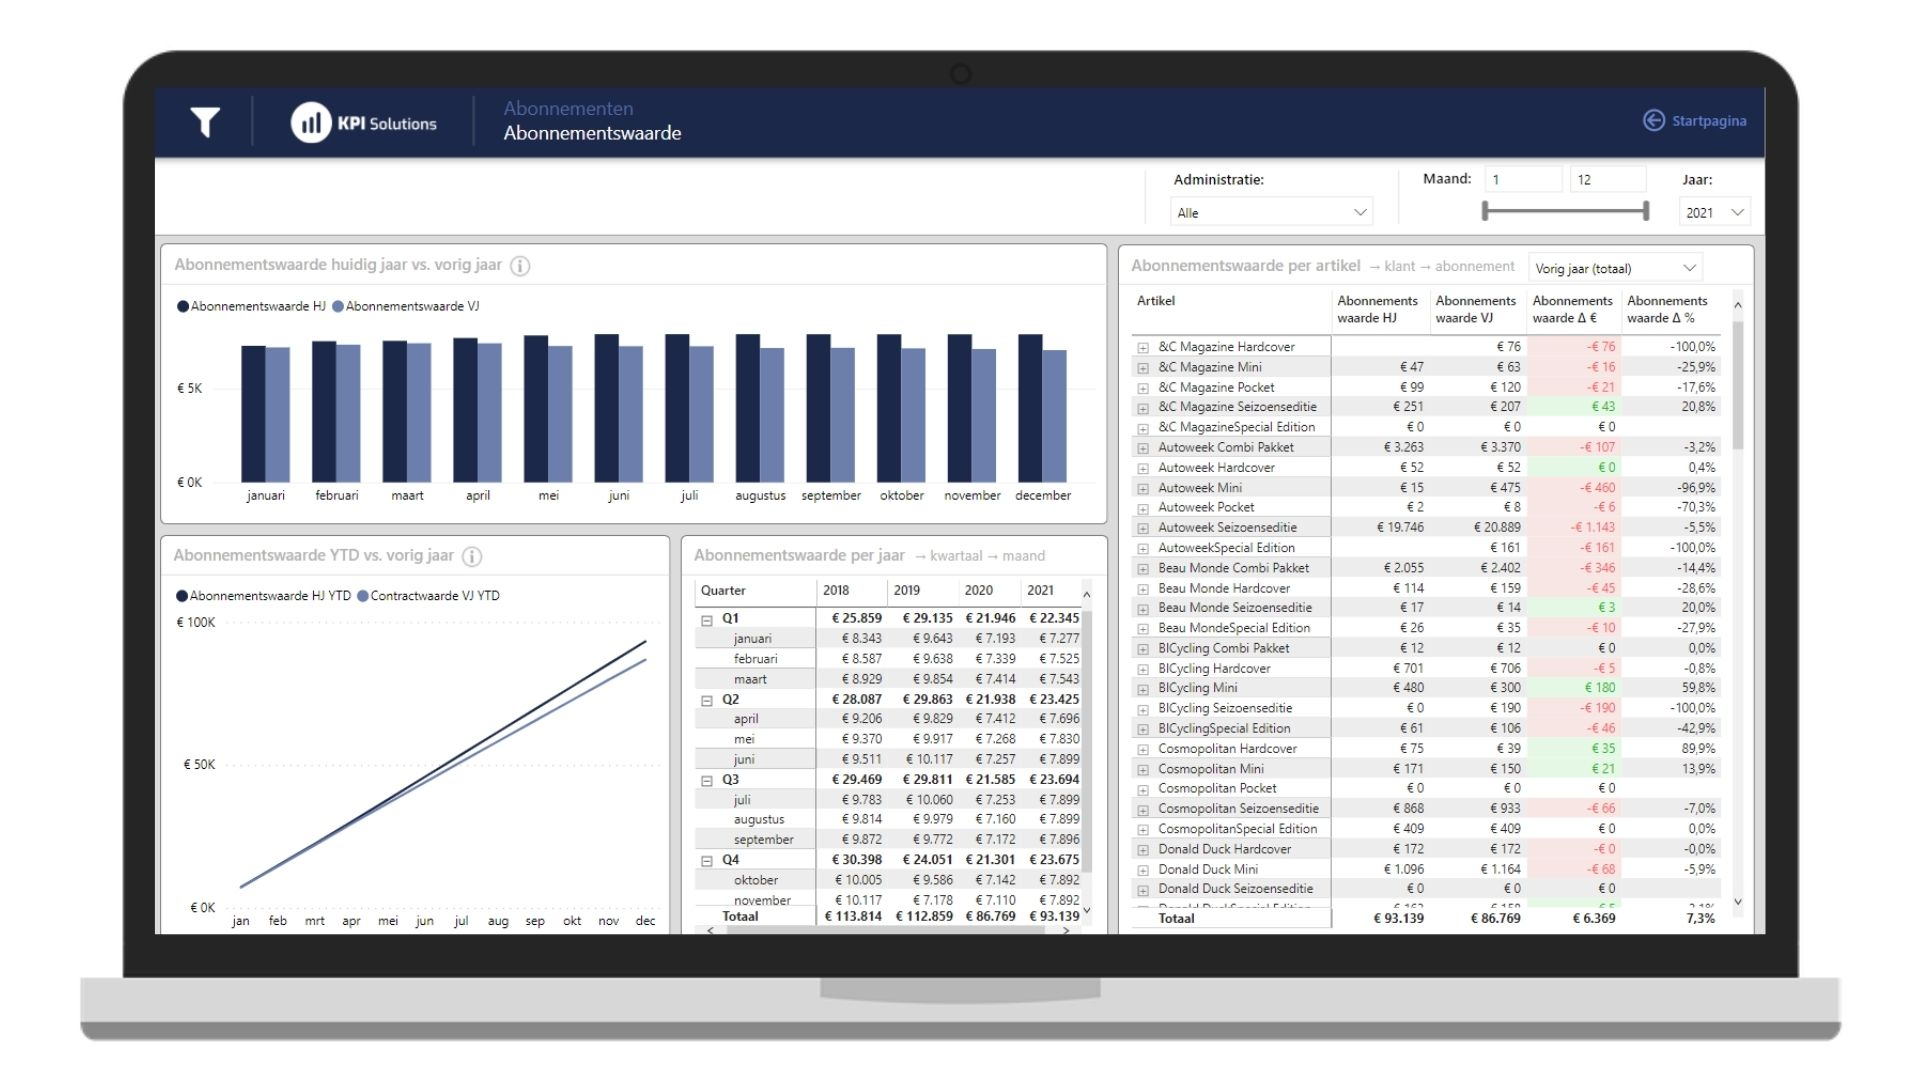 power-bi-abonnementen-saas-rapportage-dashboard-kpi-solutions